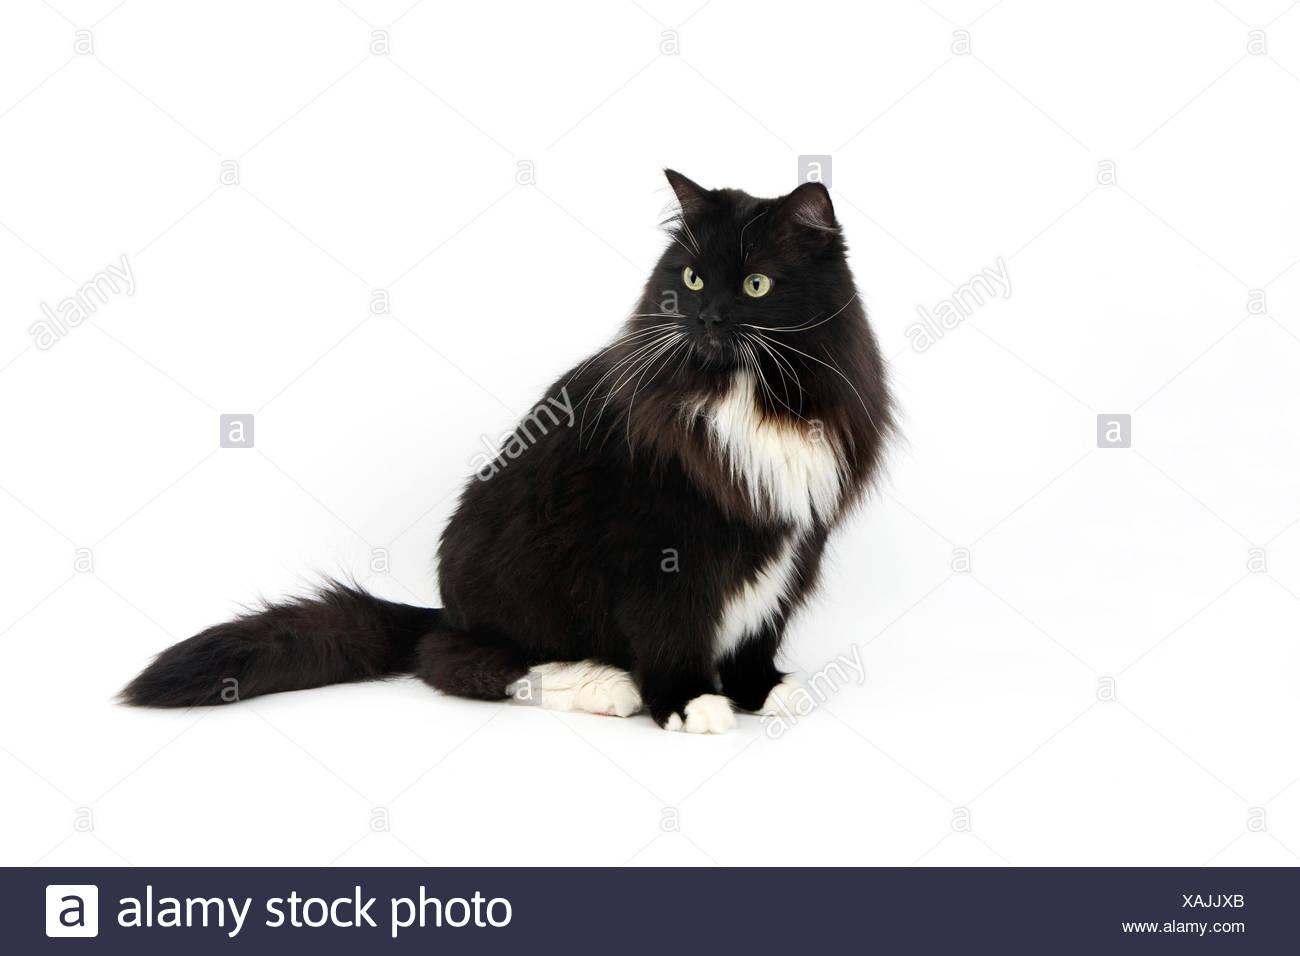 BLACK AND WHITE SIBERIAN CAT, FEMALE AGAINST WHITE BACKGROUND Stock Photo